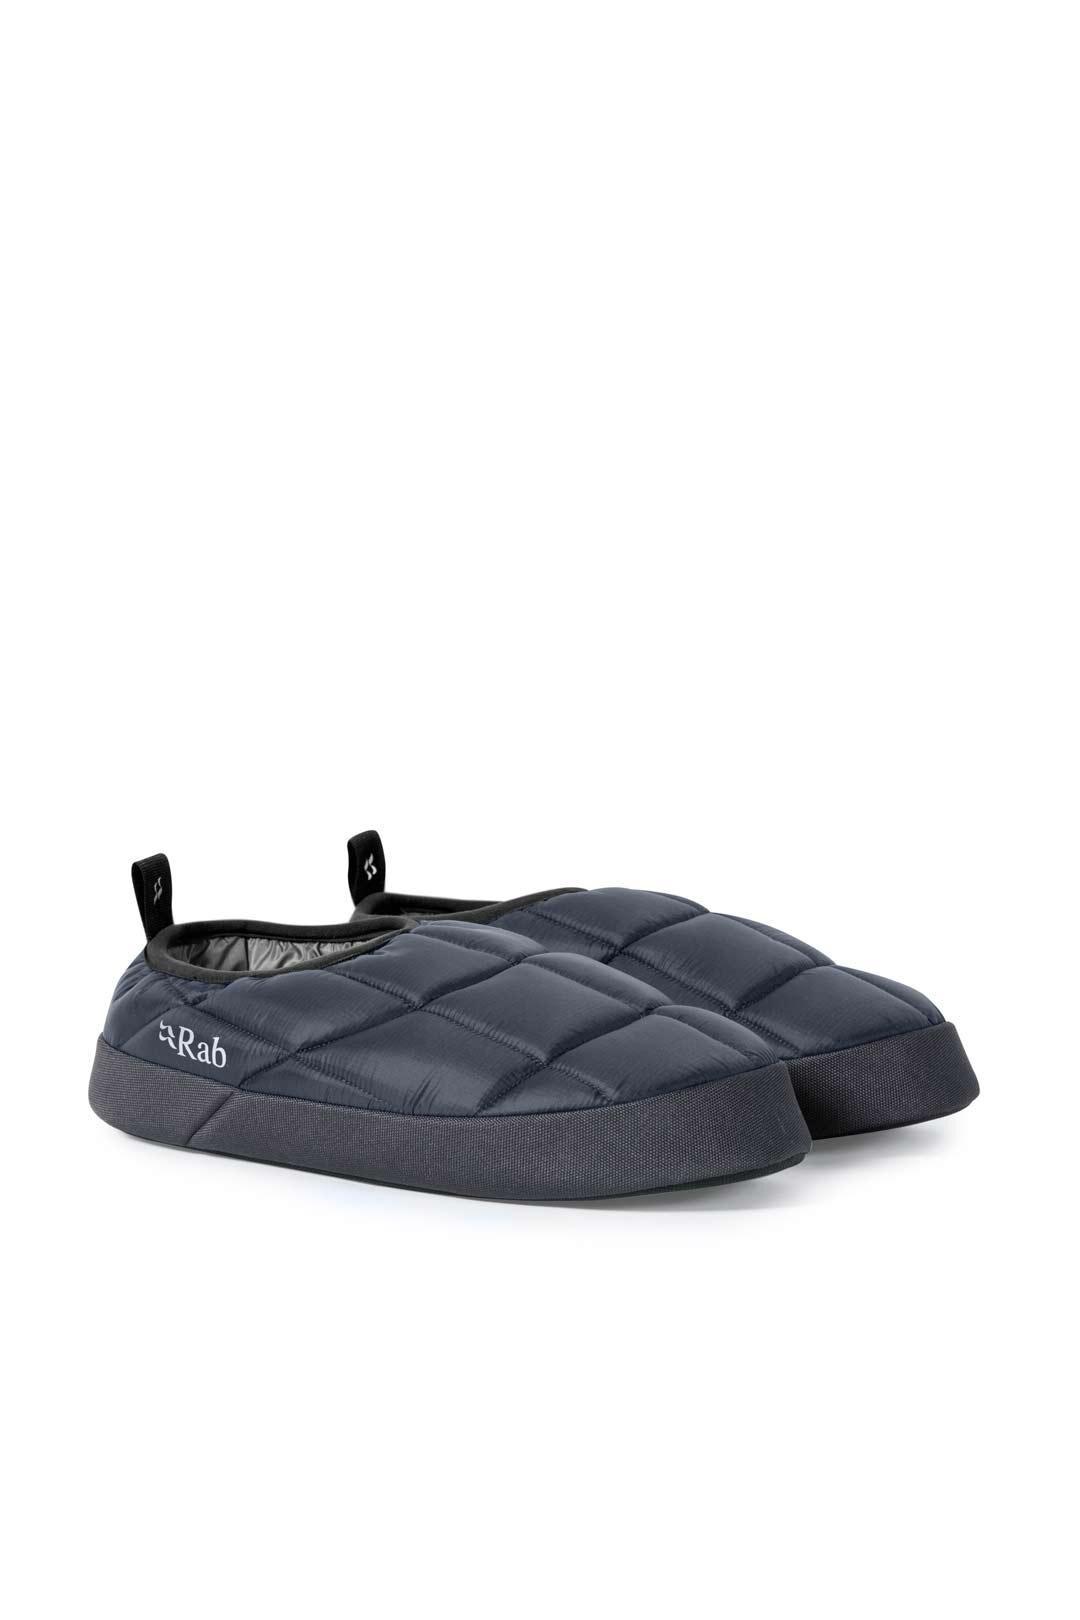 Rab Hut Slippers tøfler Beluga: QAH-25BE L: 43-44,5